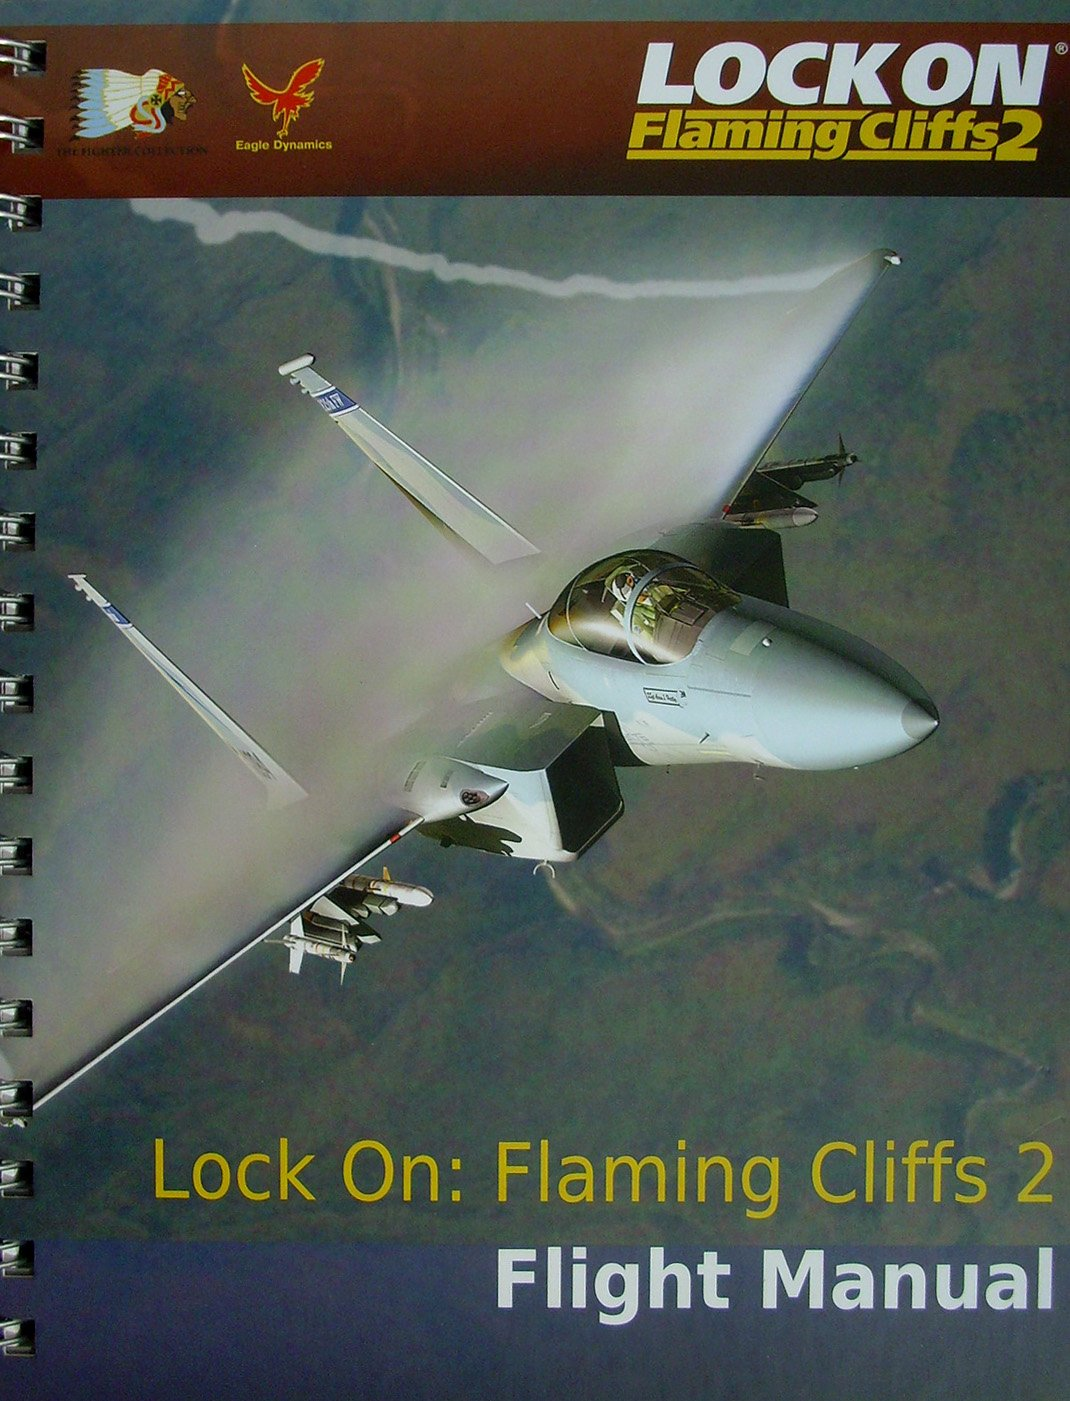 Lockon fc2 flight manual en | mc donnell douglas f 15 eagle.